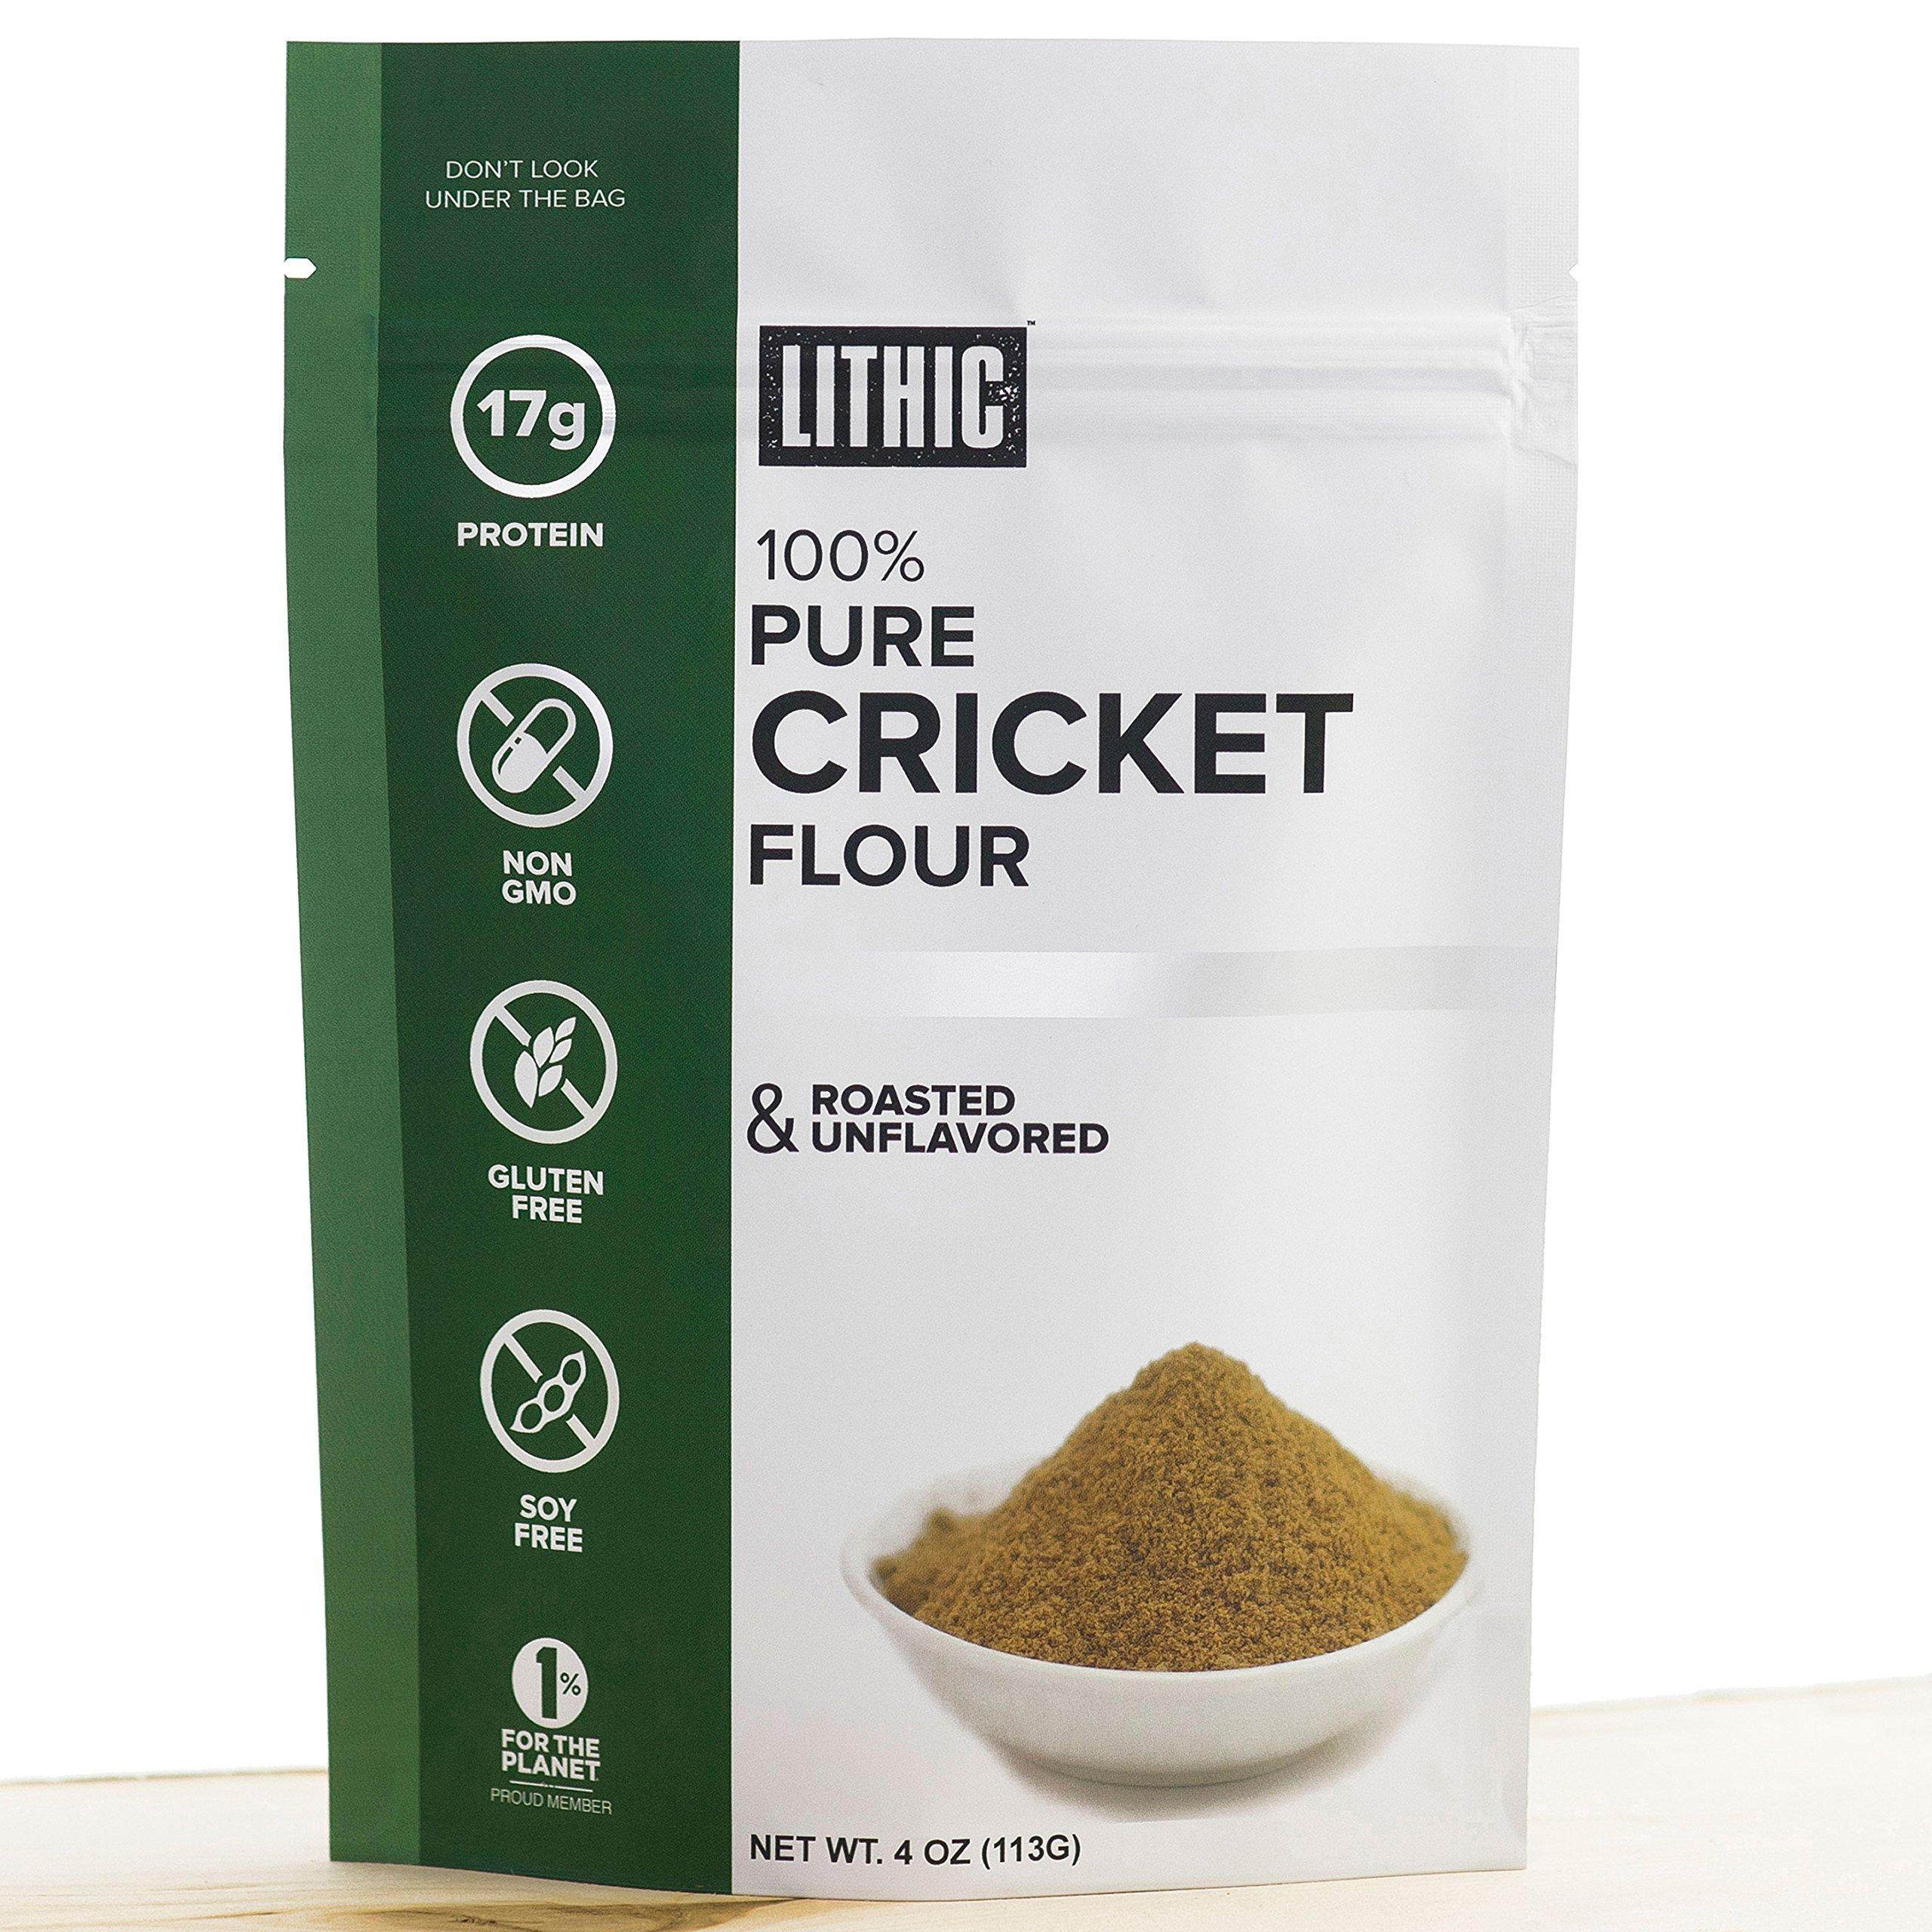 Lithic - 100% Cricket Flour 1/4LB (113g) :Sustainable, Paleo